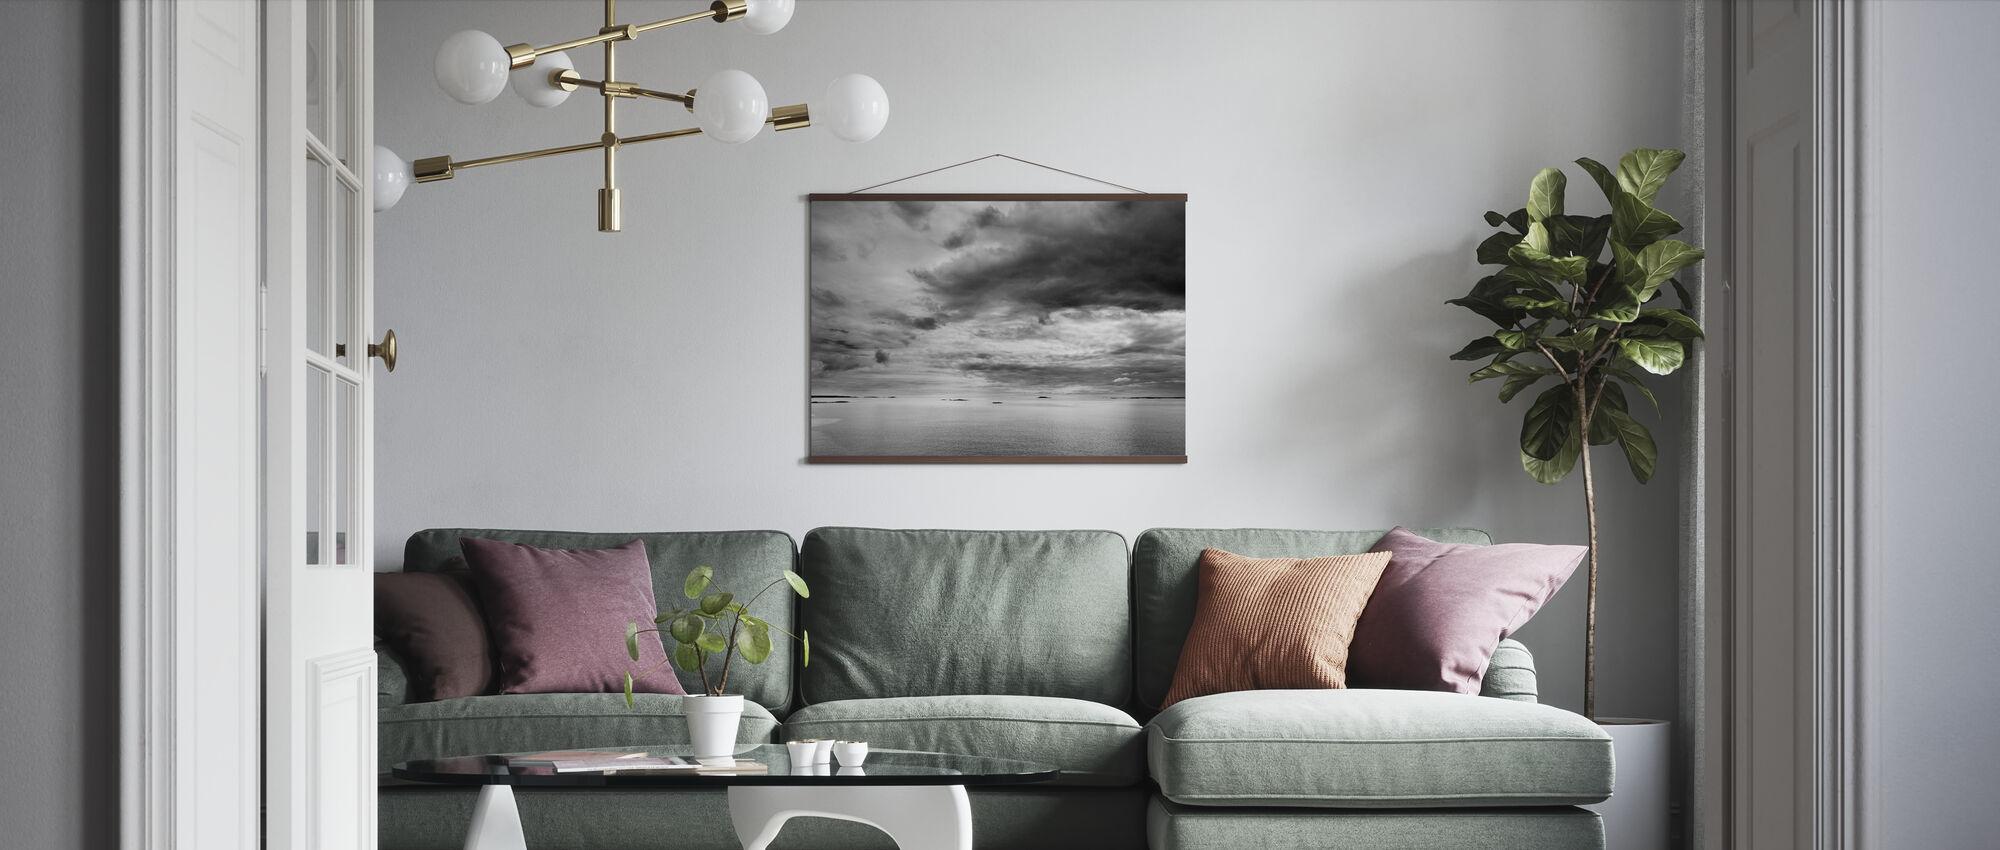 Lake Malar - Poster - Living Room